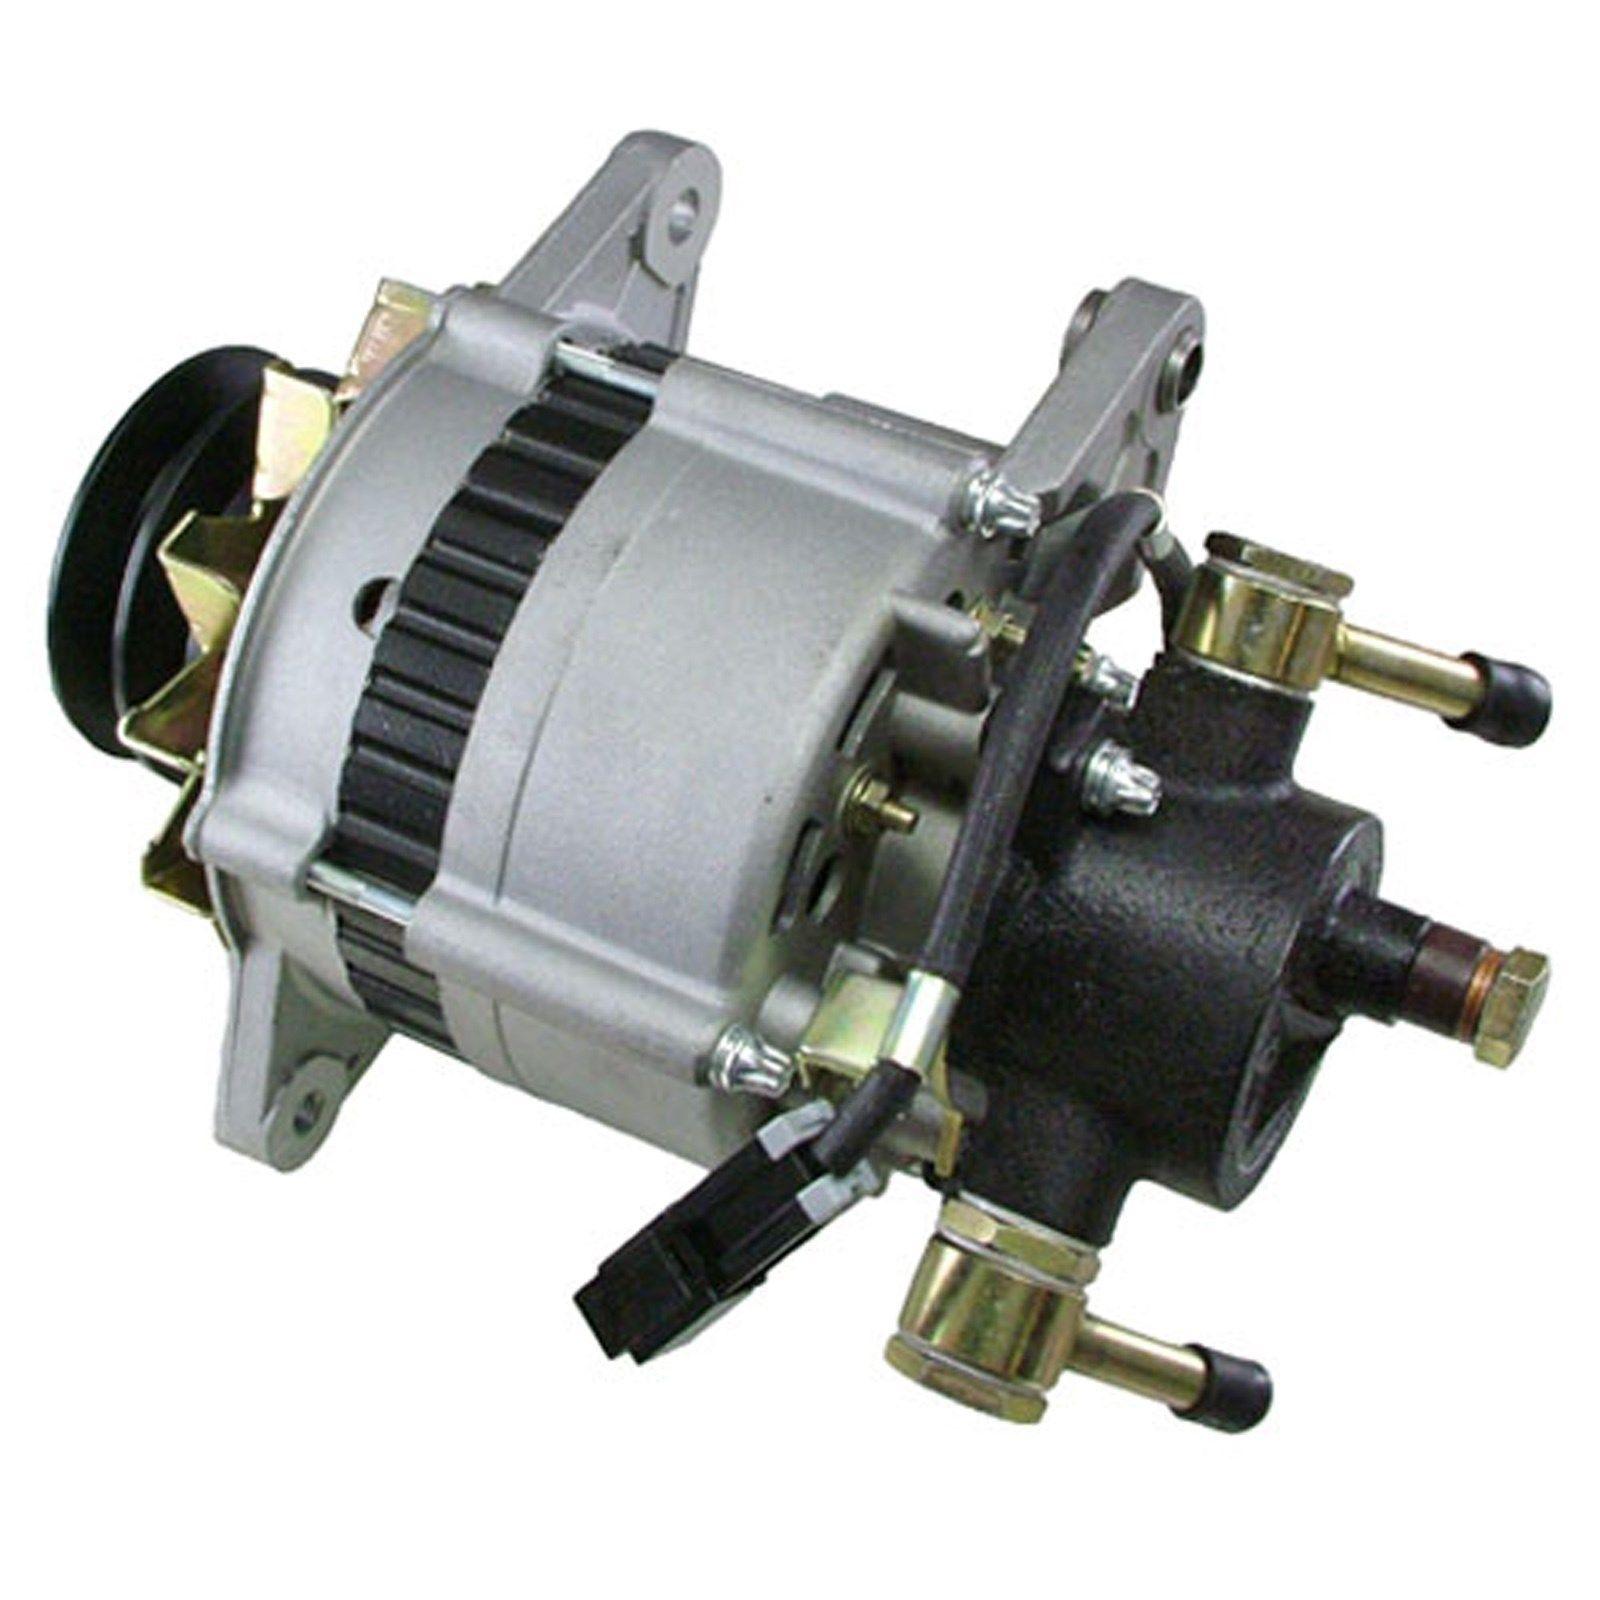 hight resolution of details about alternator for isuzu npr 3 9 3 9l turbo diesel w vac pump